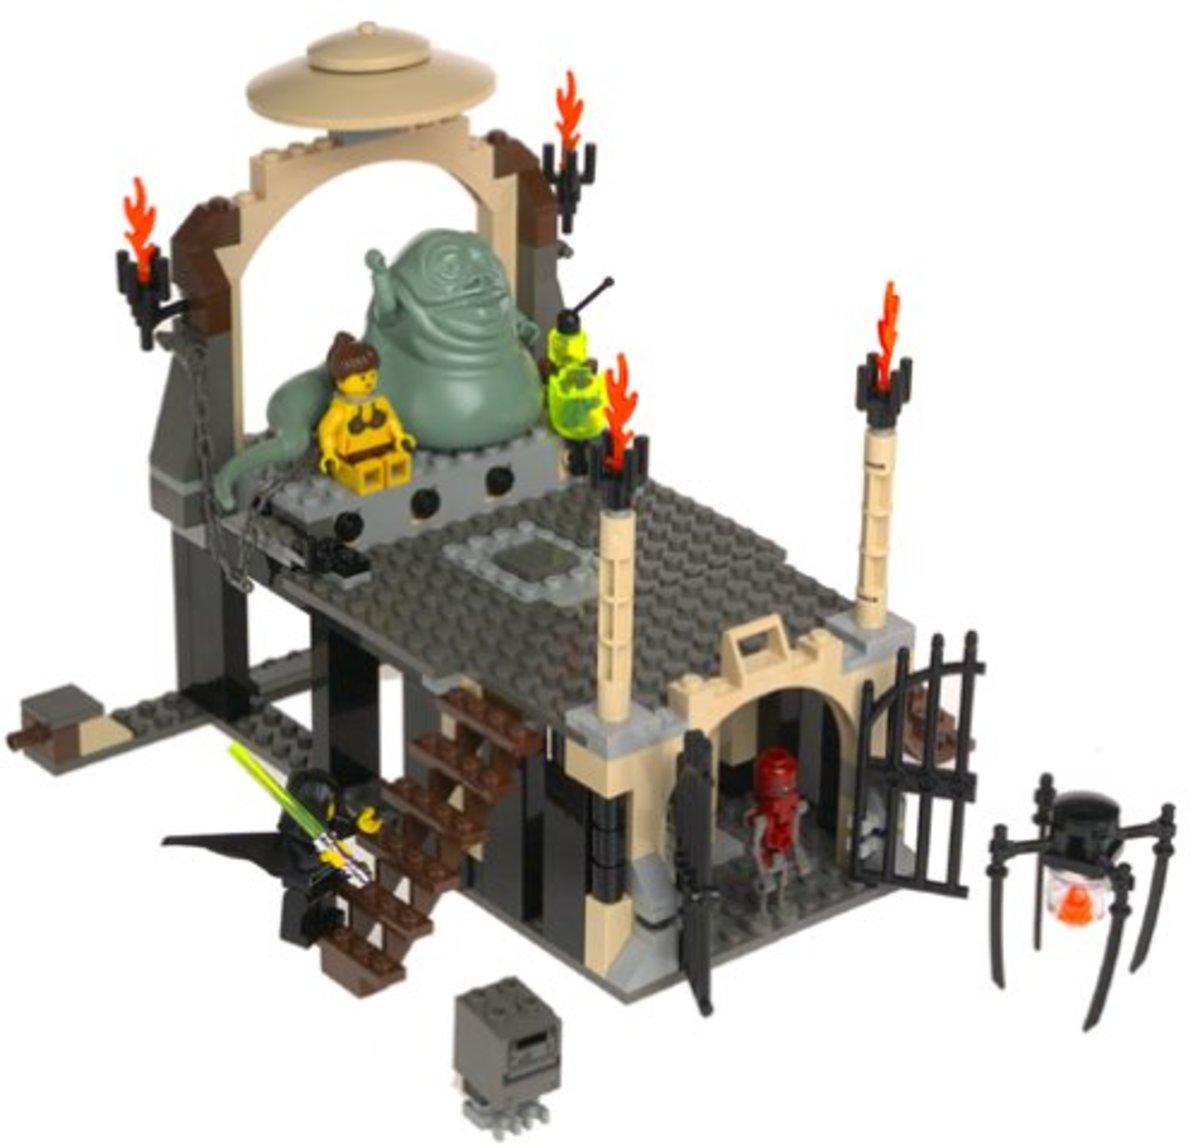 LEGO Star Wars Jabba's Palace 4480 Assembled